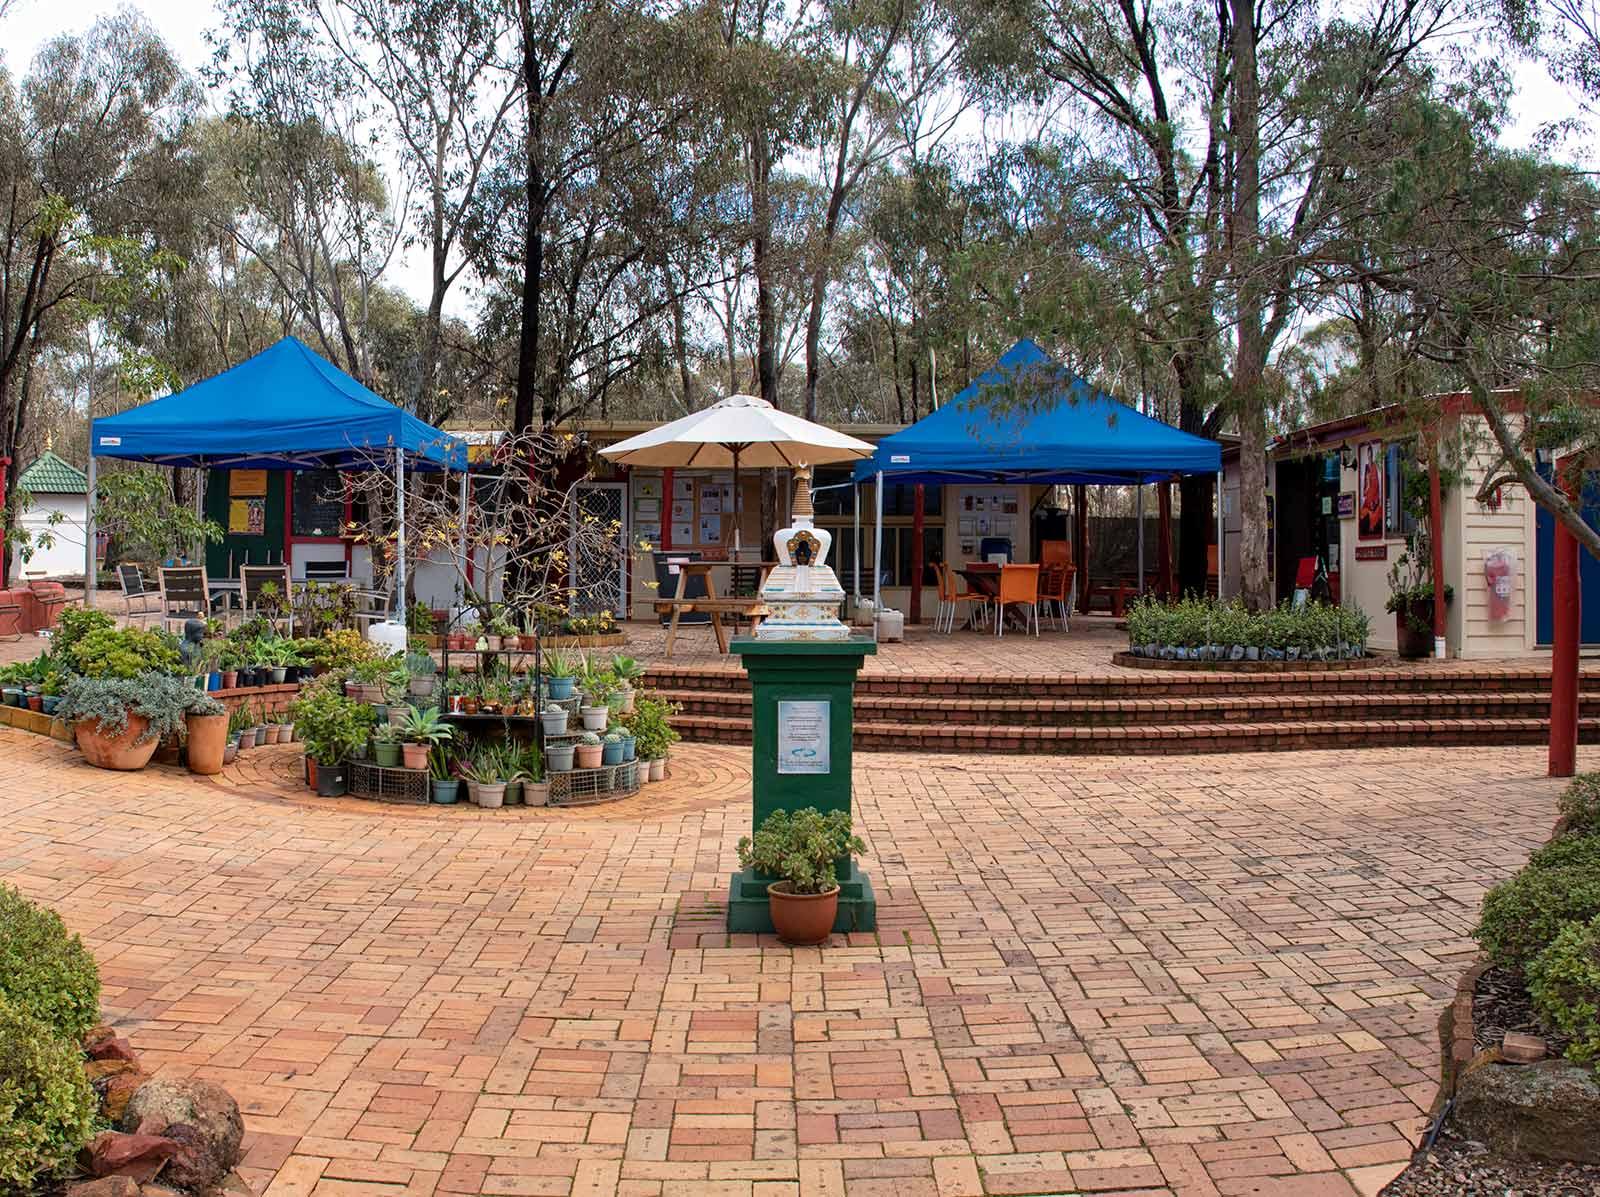 Courtyard and stupa